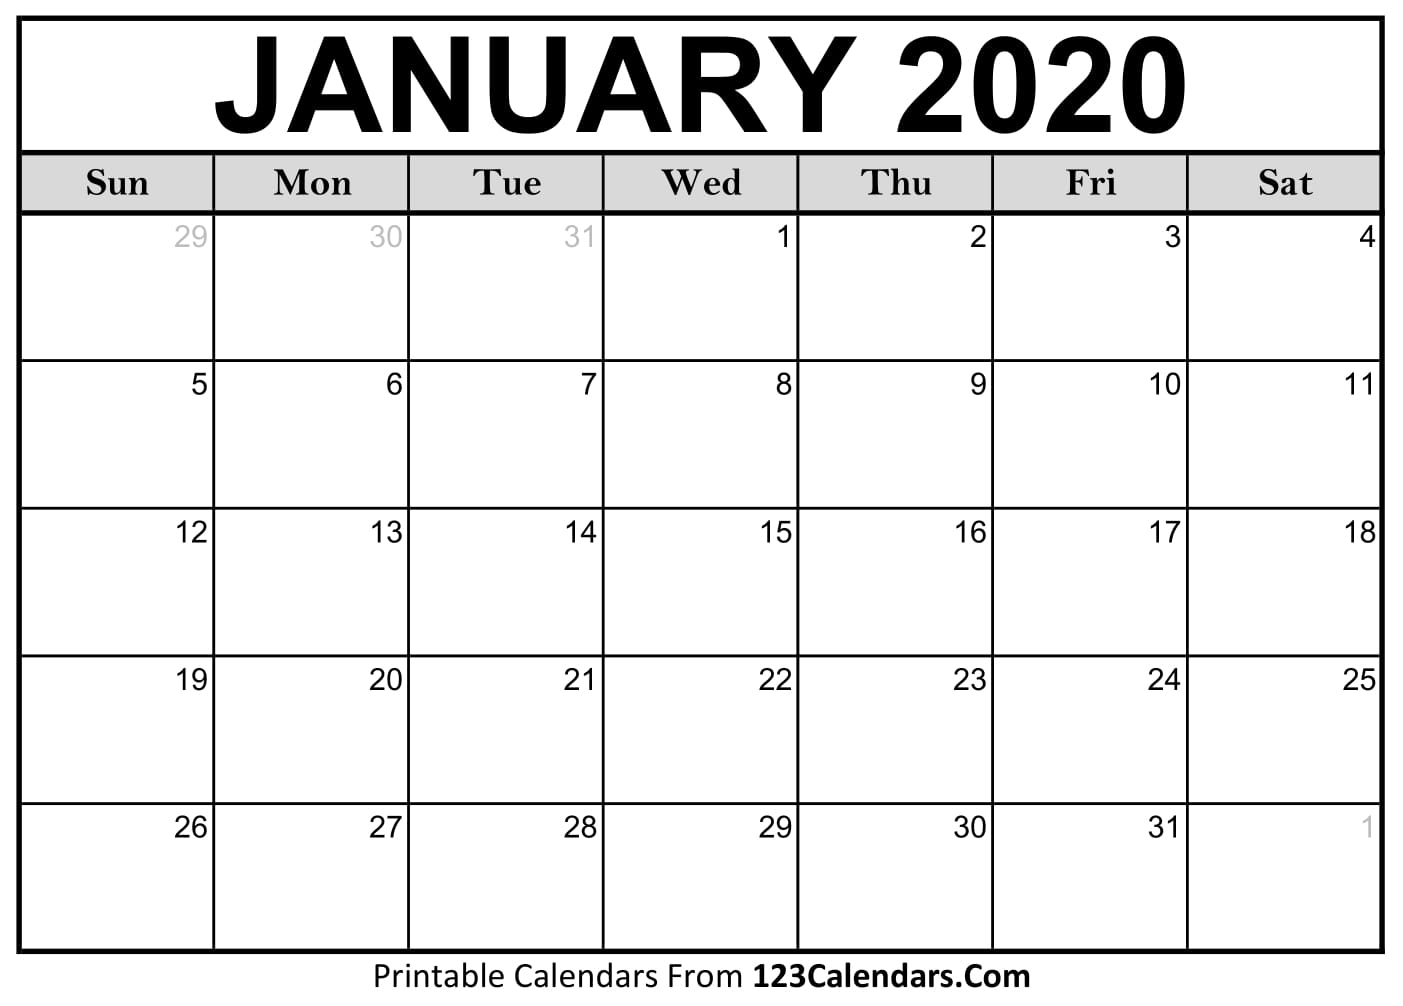 January 2020 Printable Calendar   123Calendars